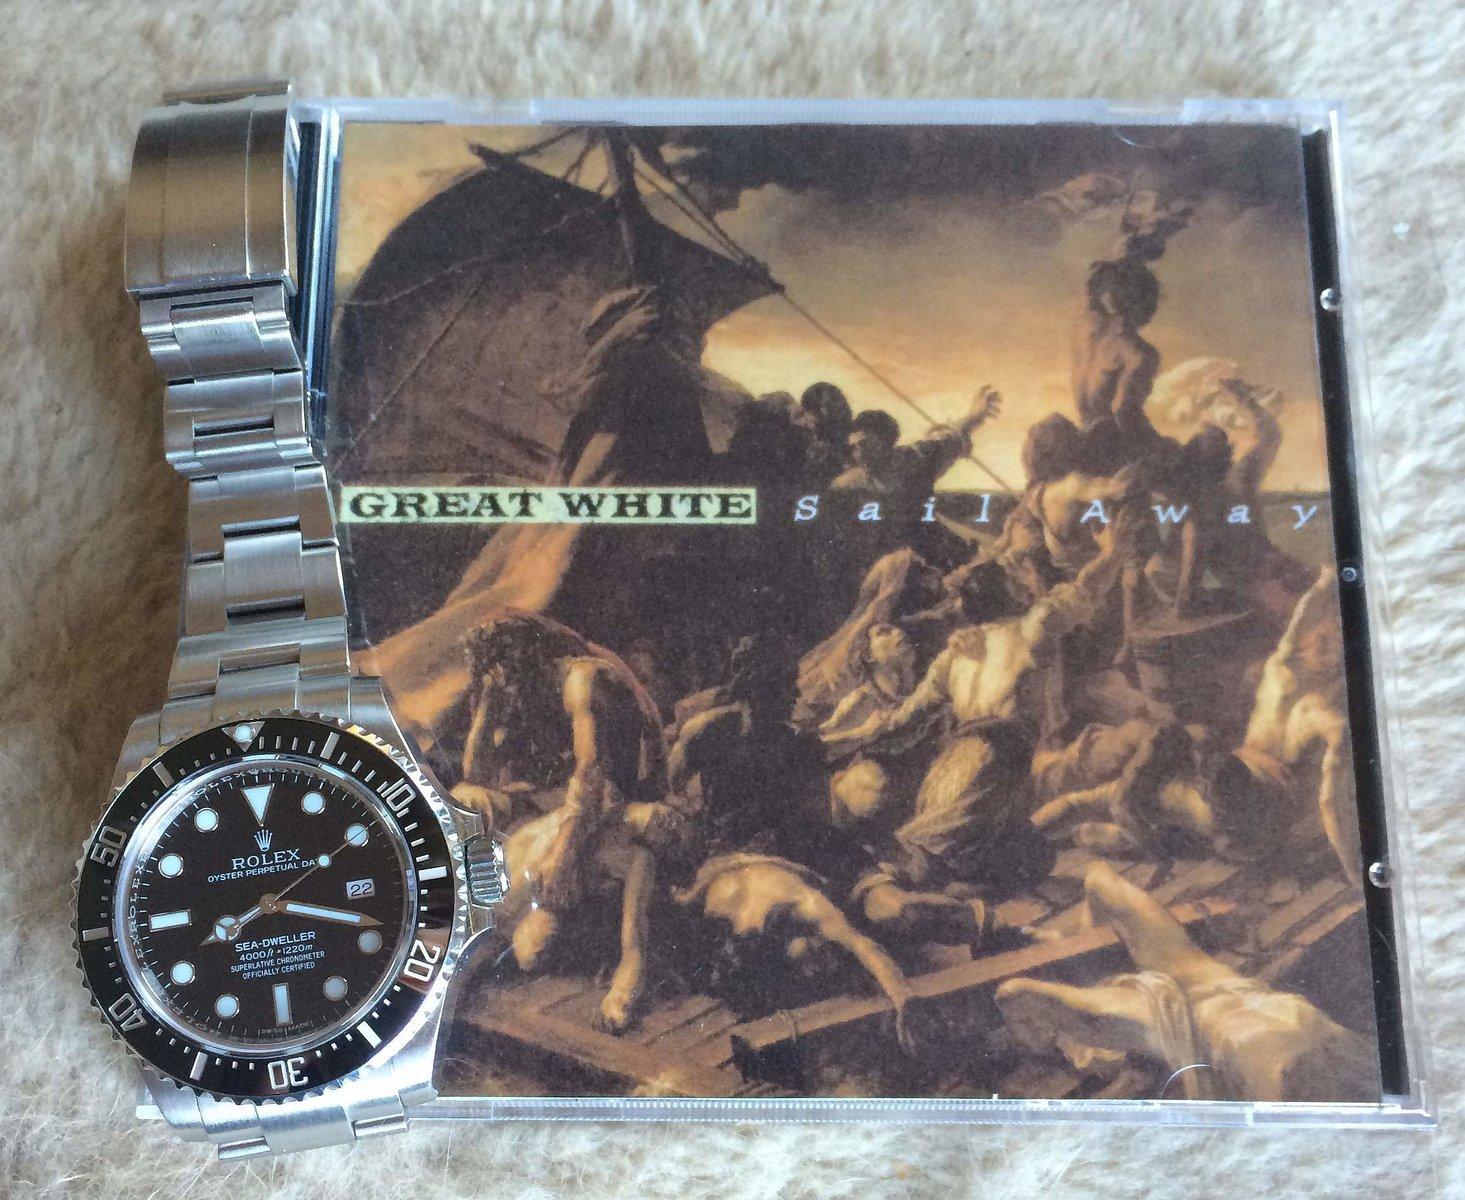 Rolex 2018-05-22 (CD).